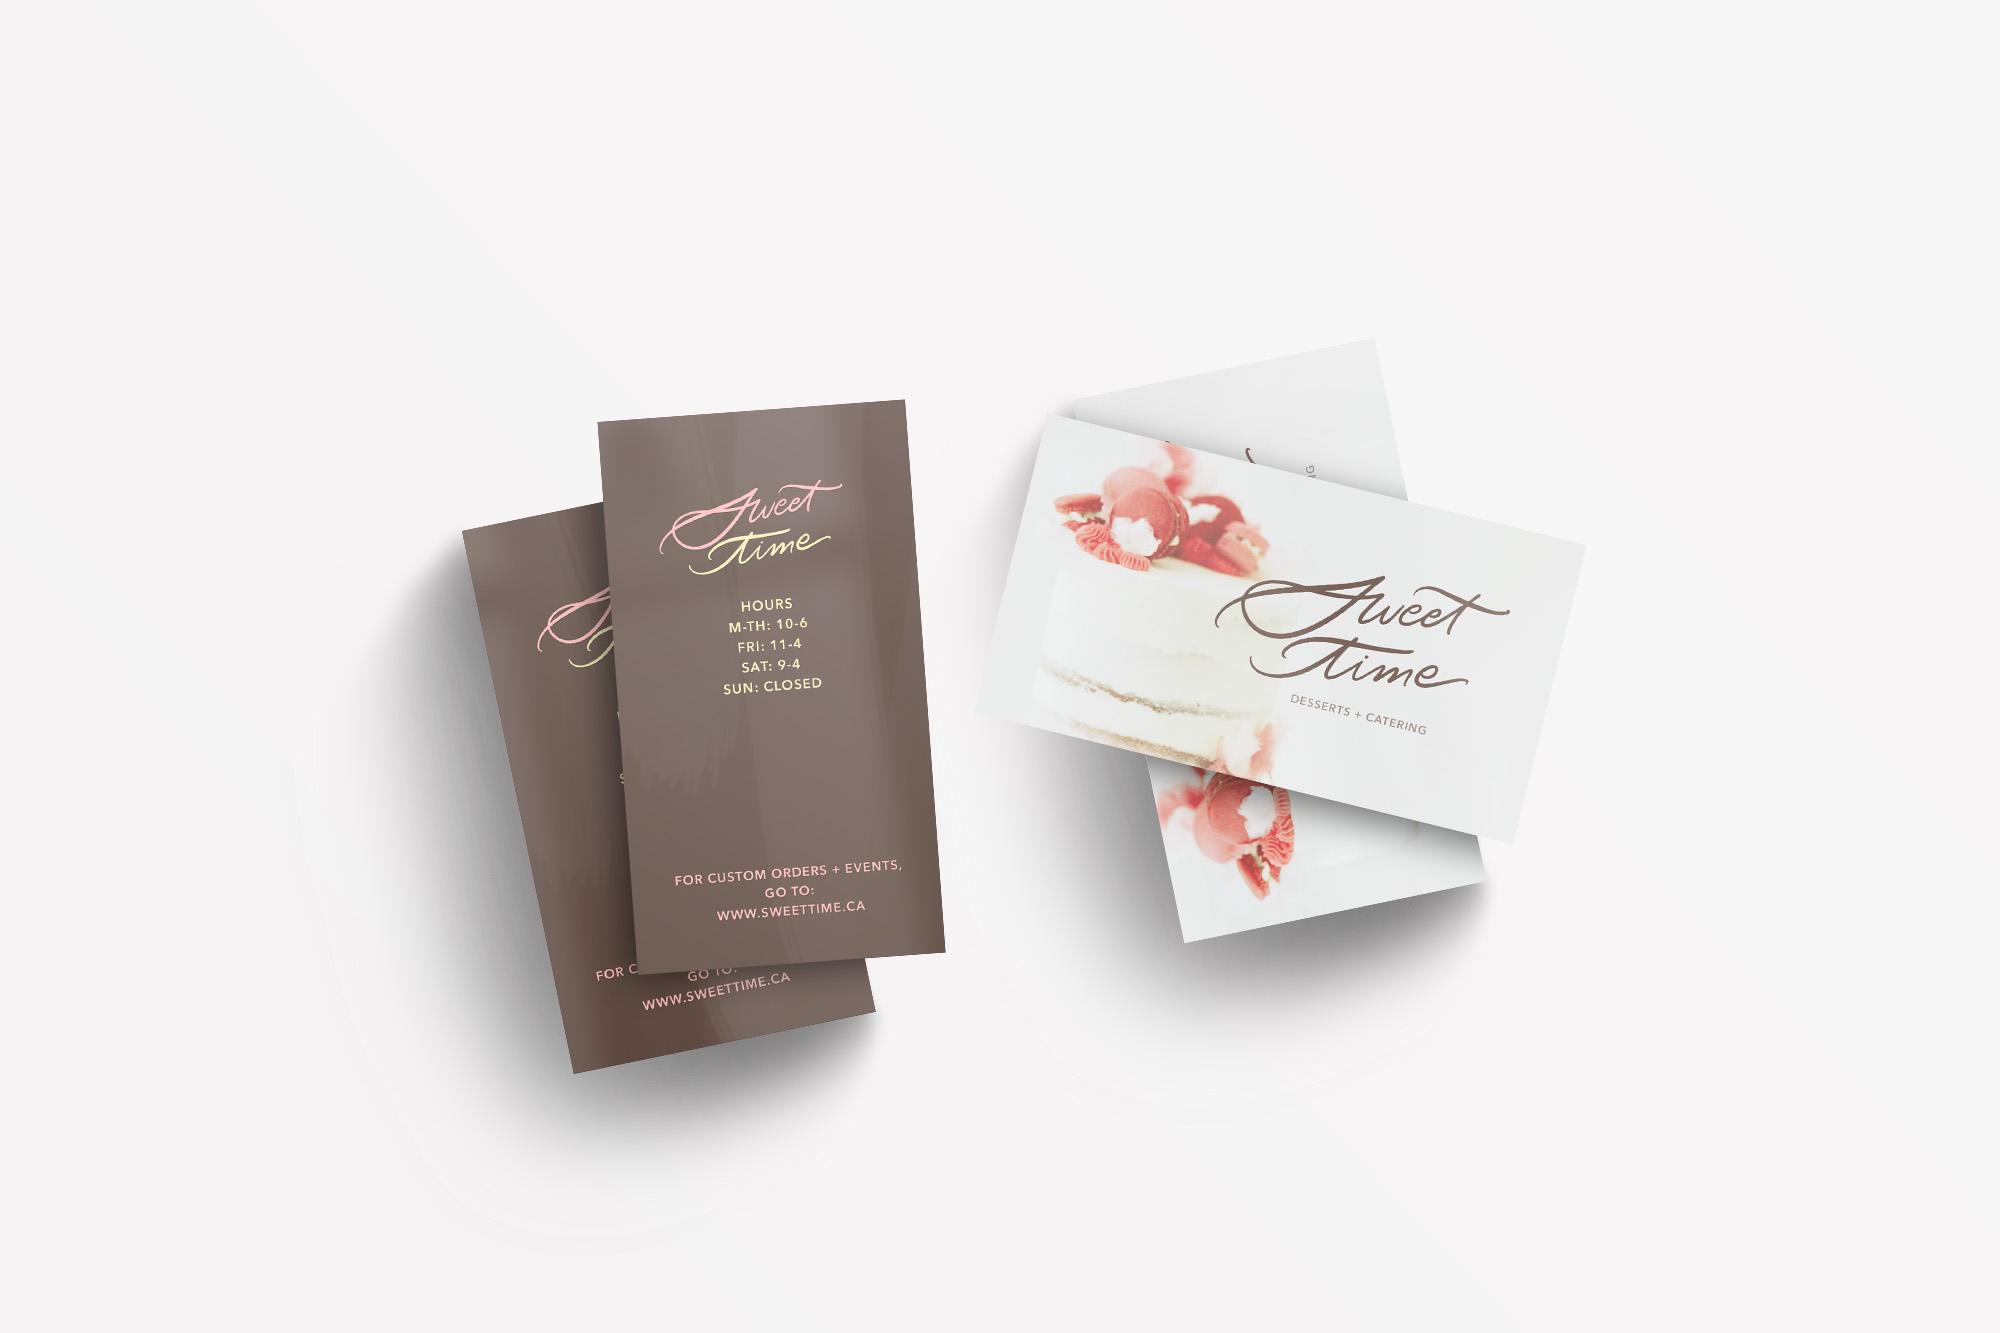 Branding Portfolio - Sweet Time Logo Design and Branding Package - Bexley Design Co